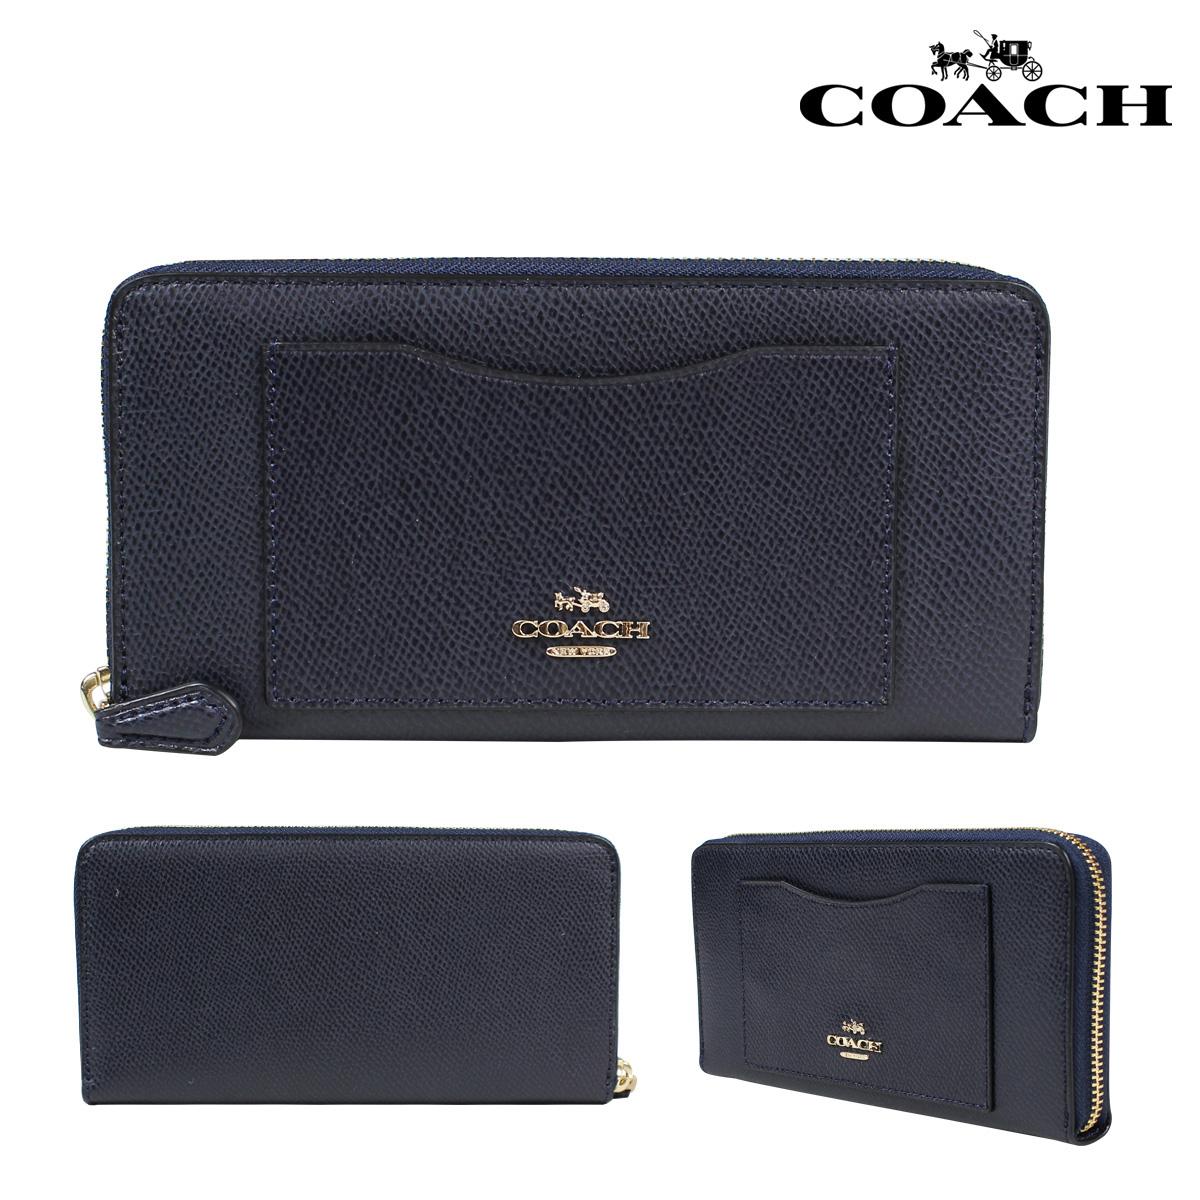 COACH コーチ 財布 長財布 レディース F54007 ミッドナイト